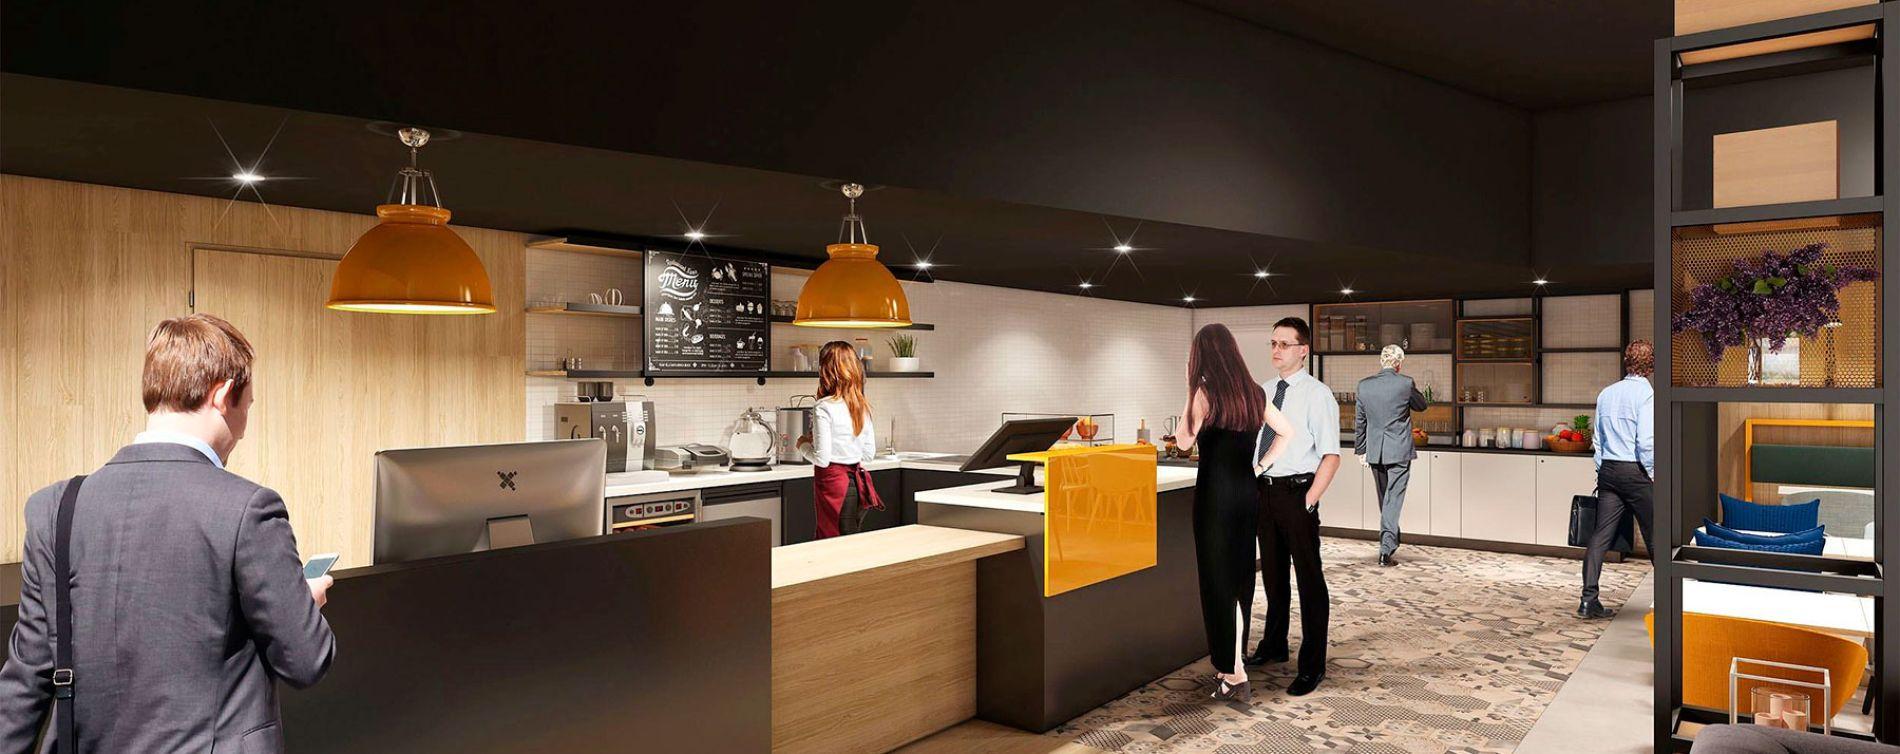 Roissy-en-France : programme immobilier neuve « L'Envol » (3)